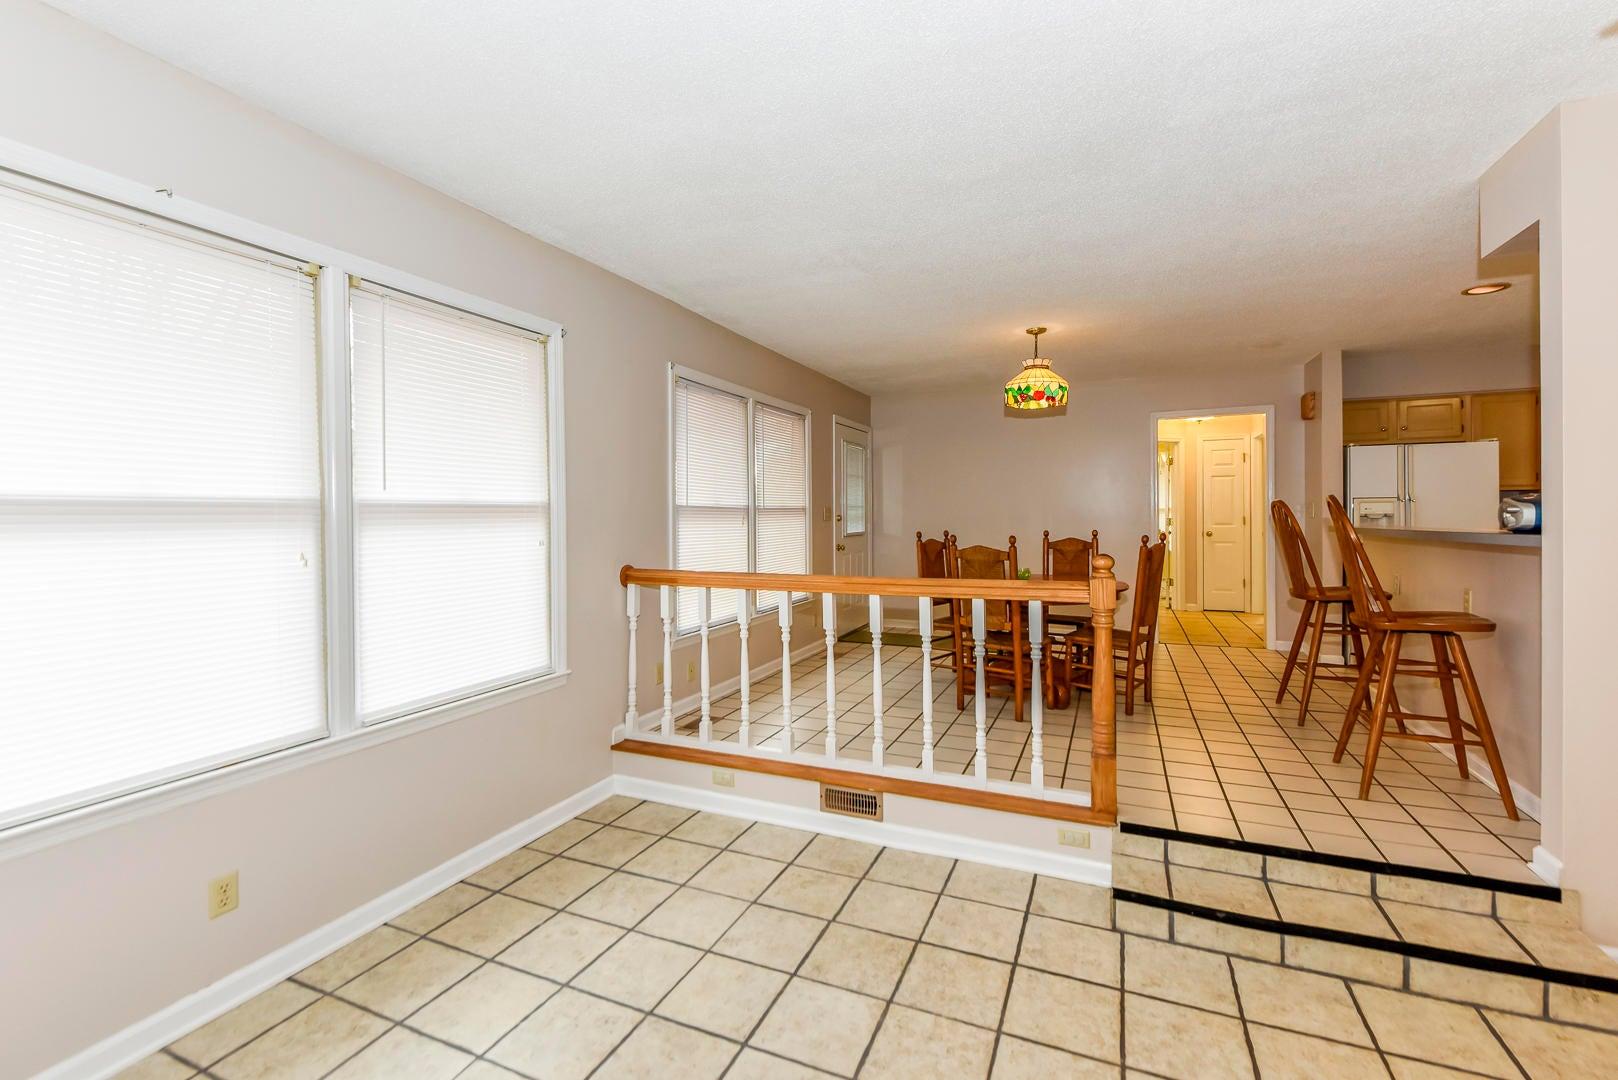 RENTAL HOUSE-DINING RM